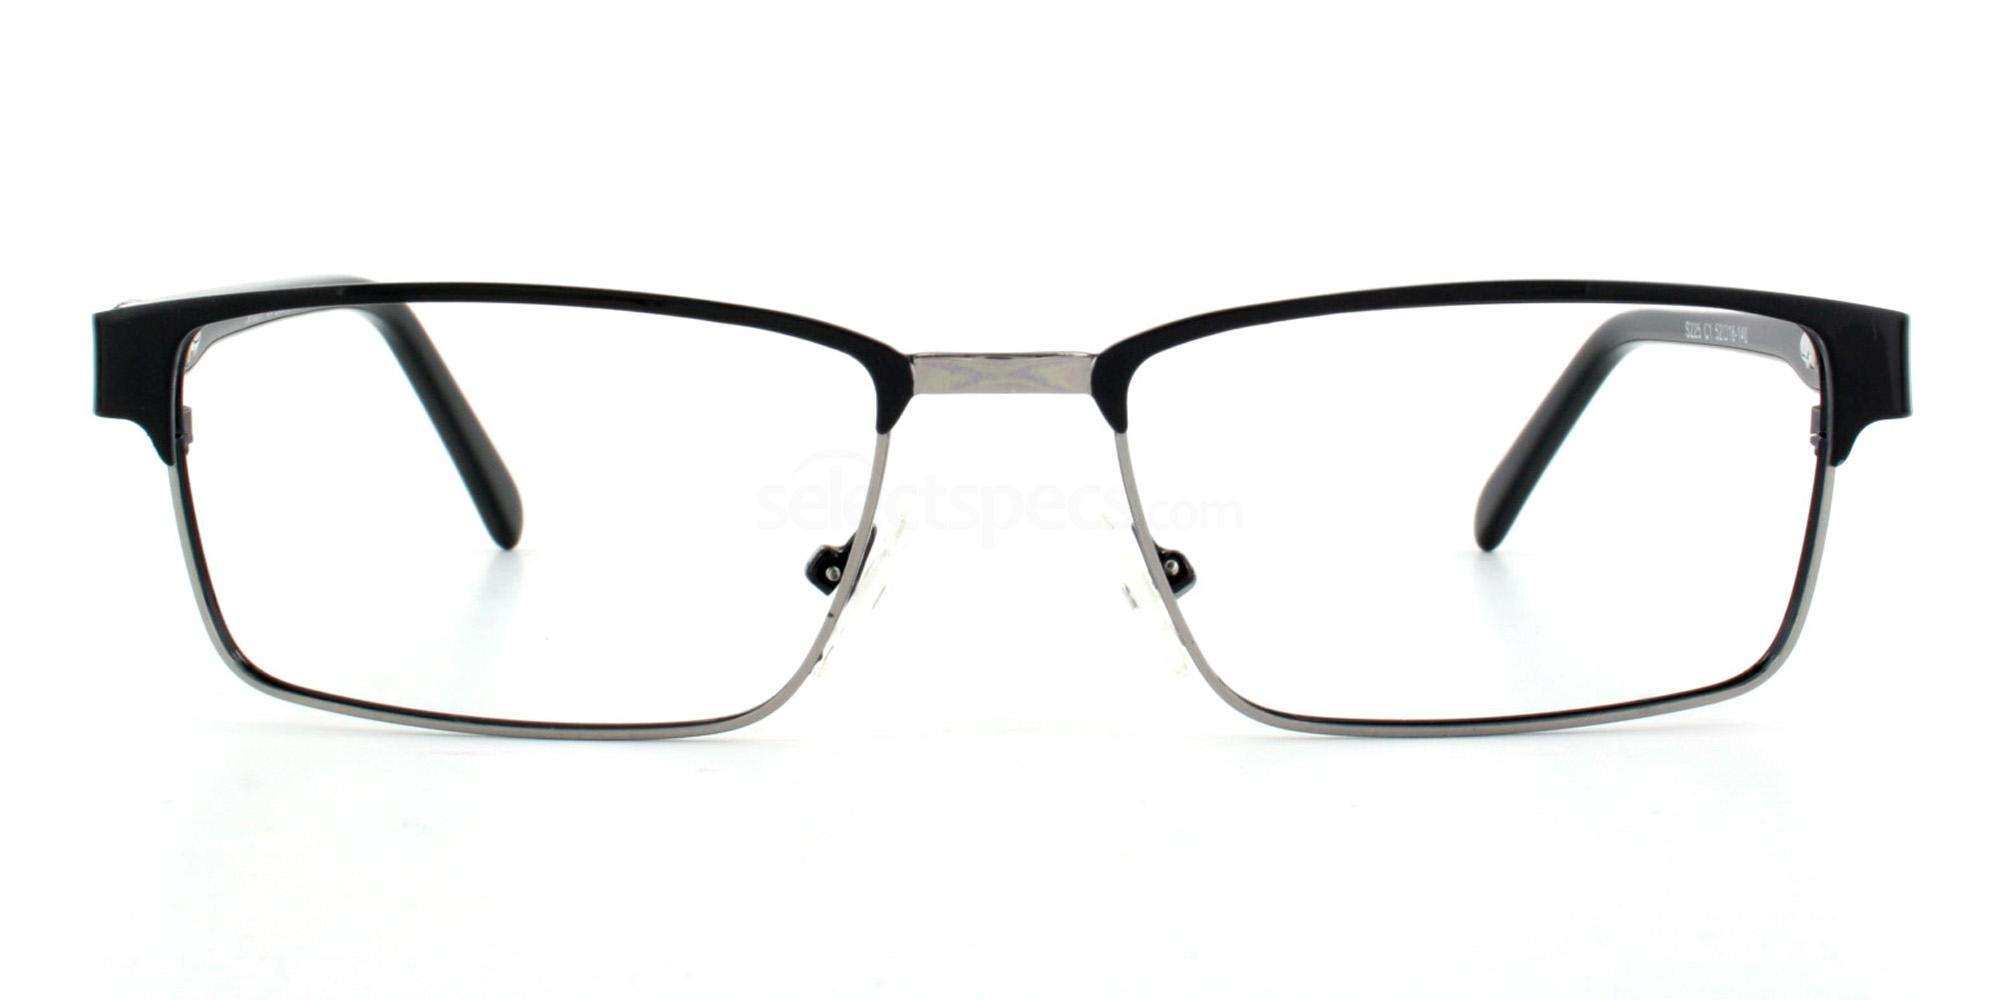 C1 SENATOR 225 Glasses, Senator